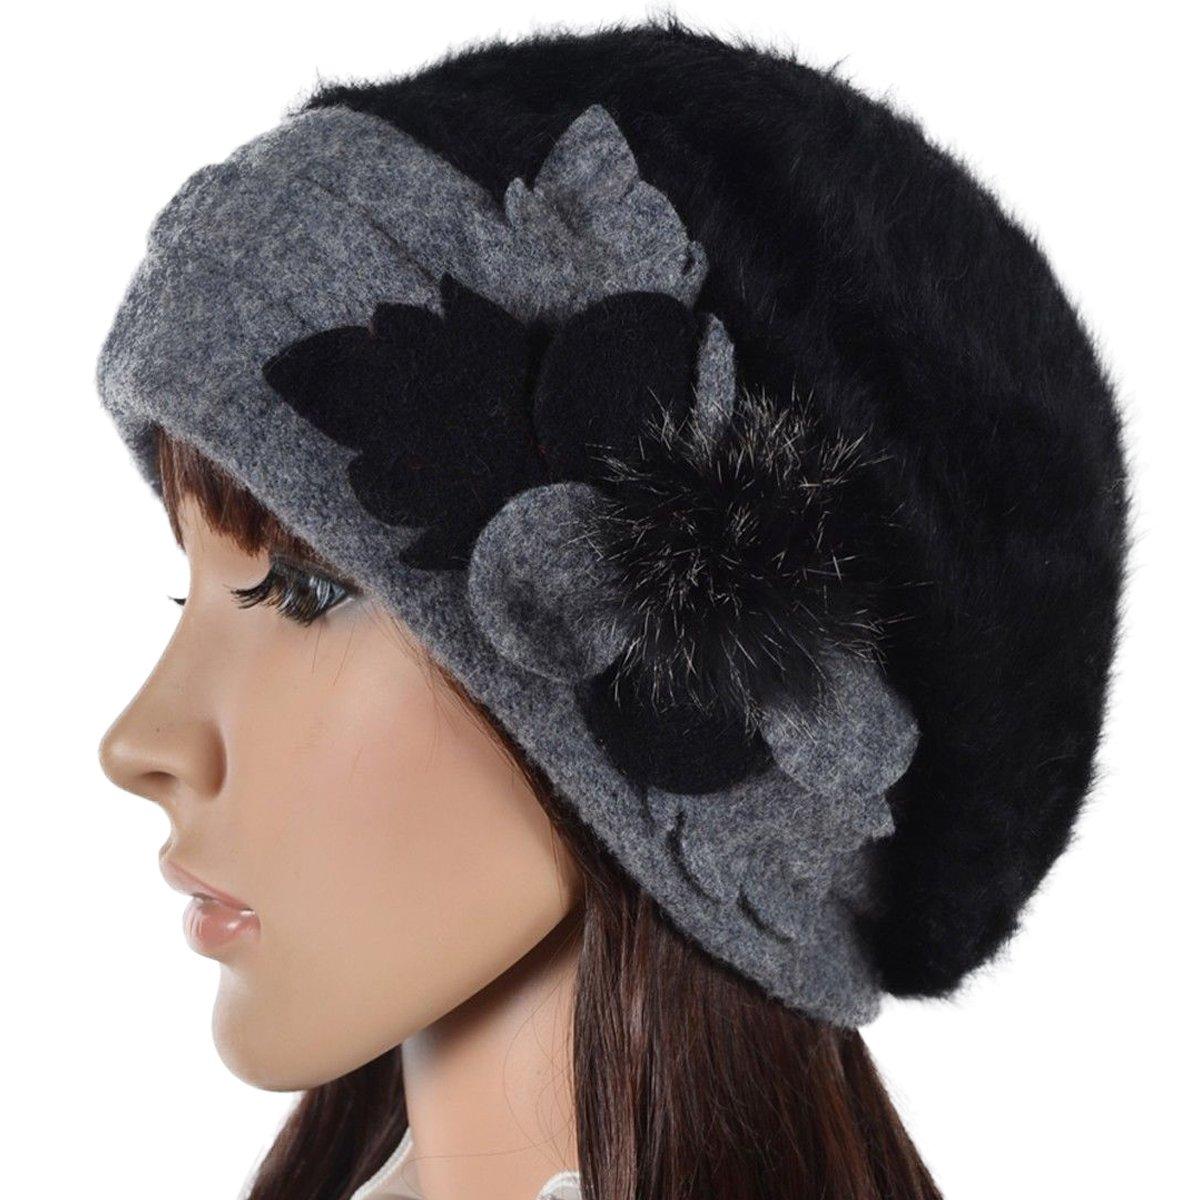 Wimdream Women's 100% Wool Cloche Hat Winter C020 (Br022-Black)